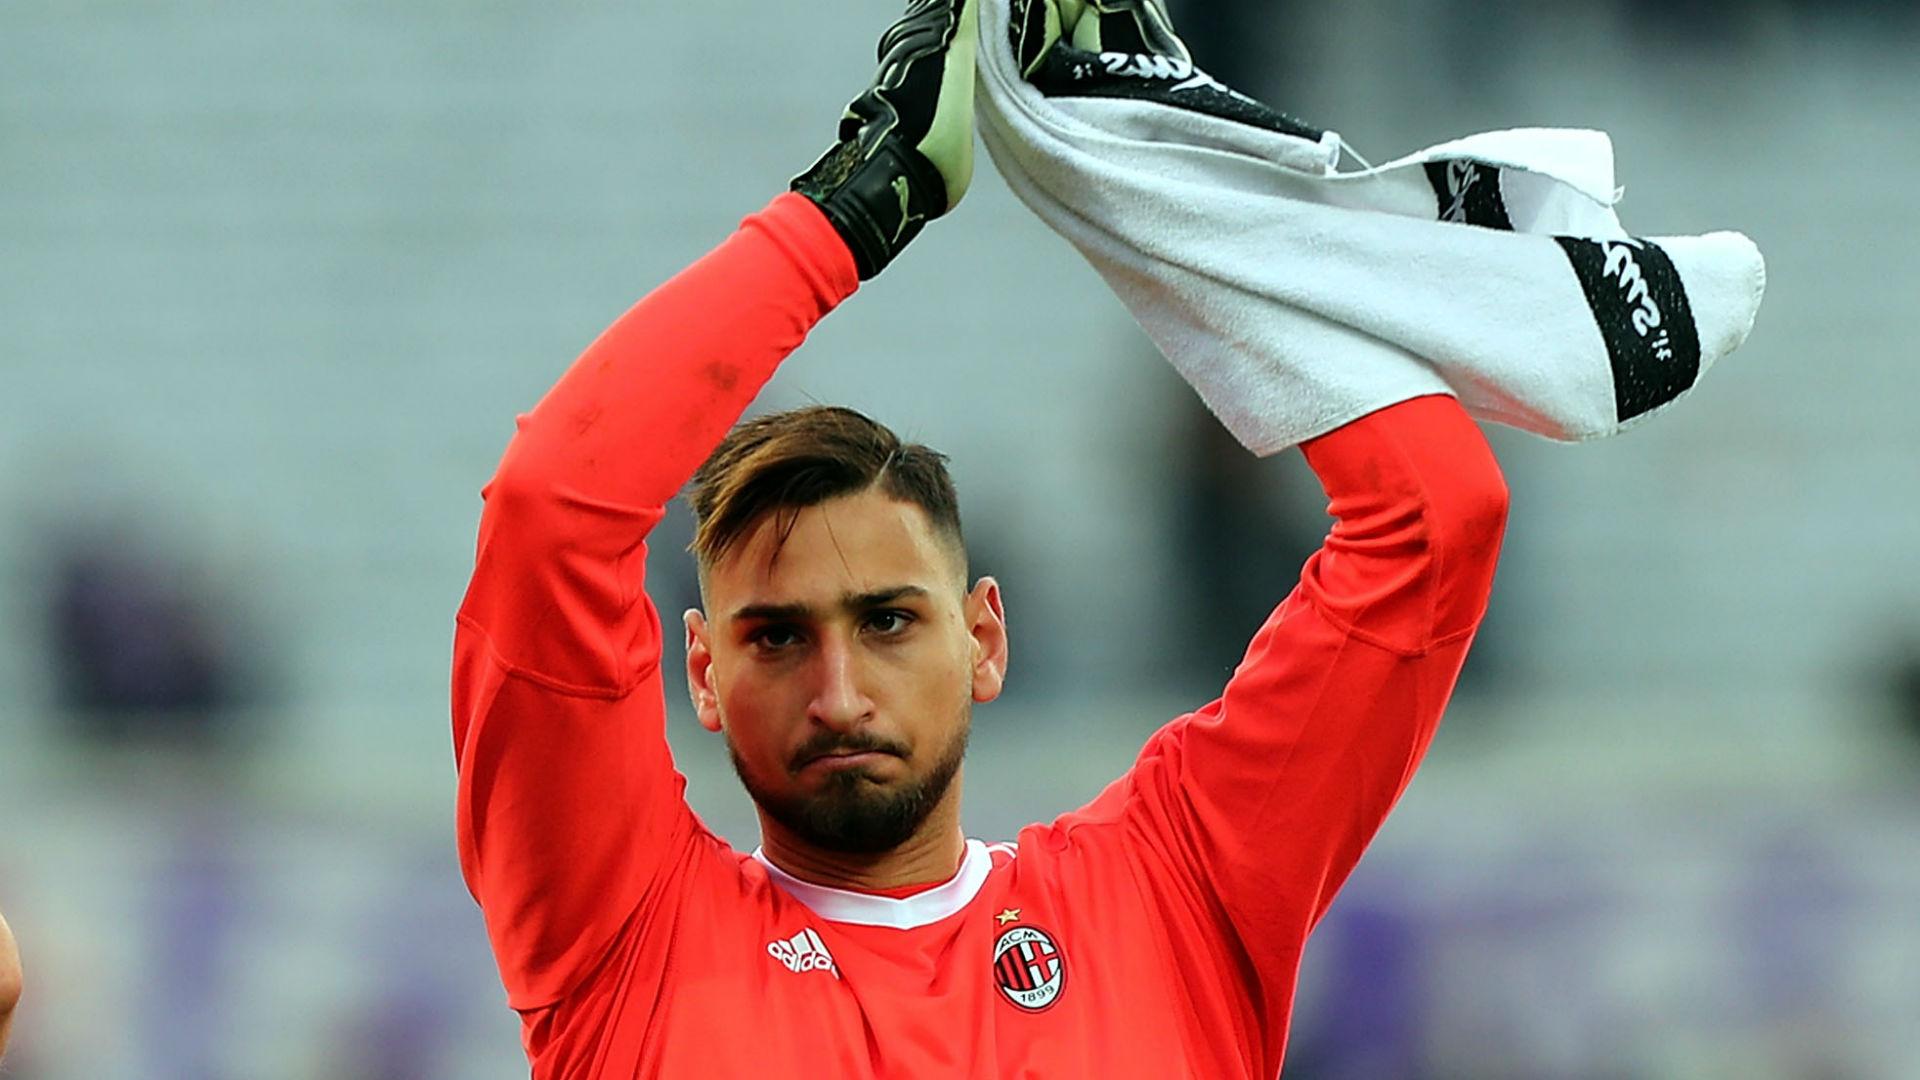 Donnarumma allays AC Milan exit fears: 'I'm very happy here'